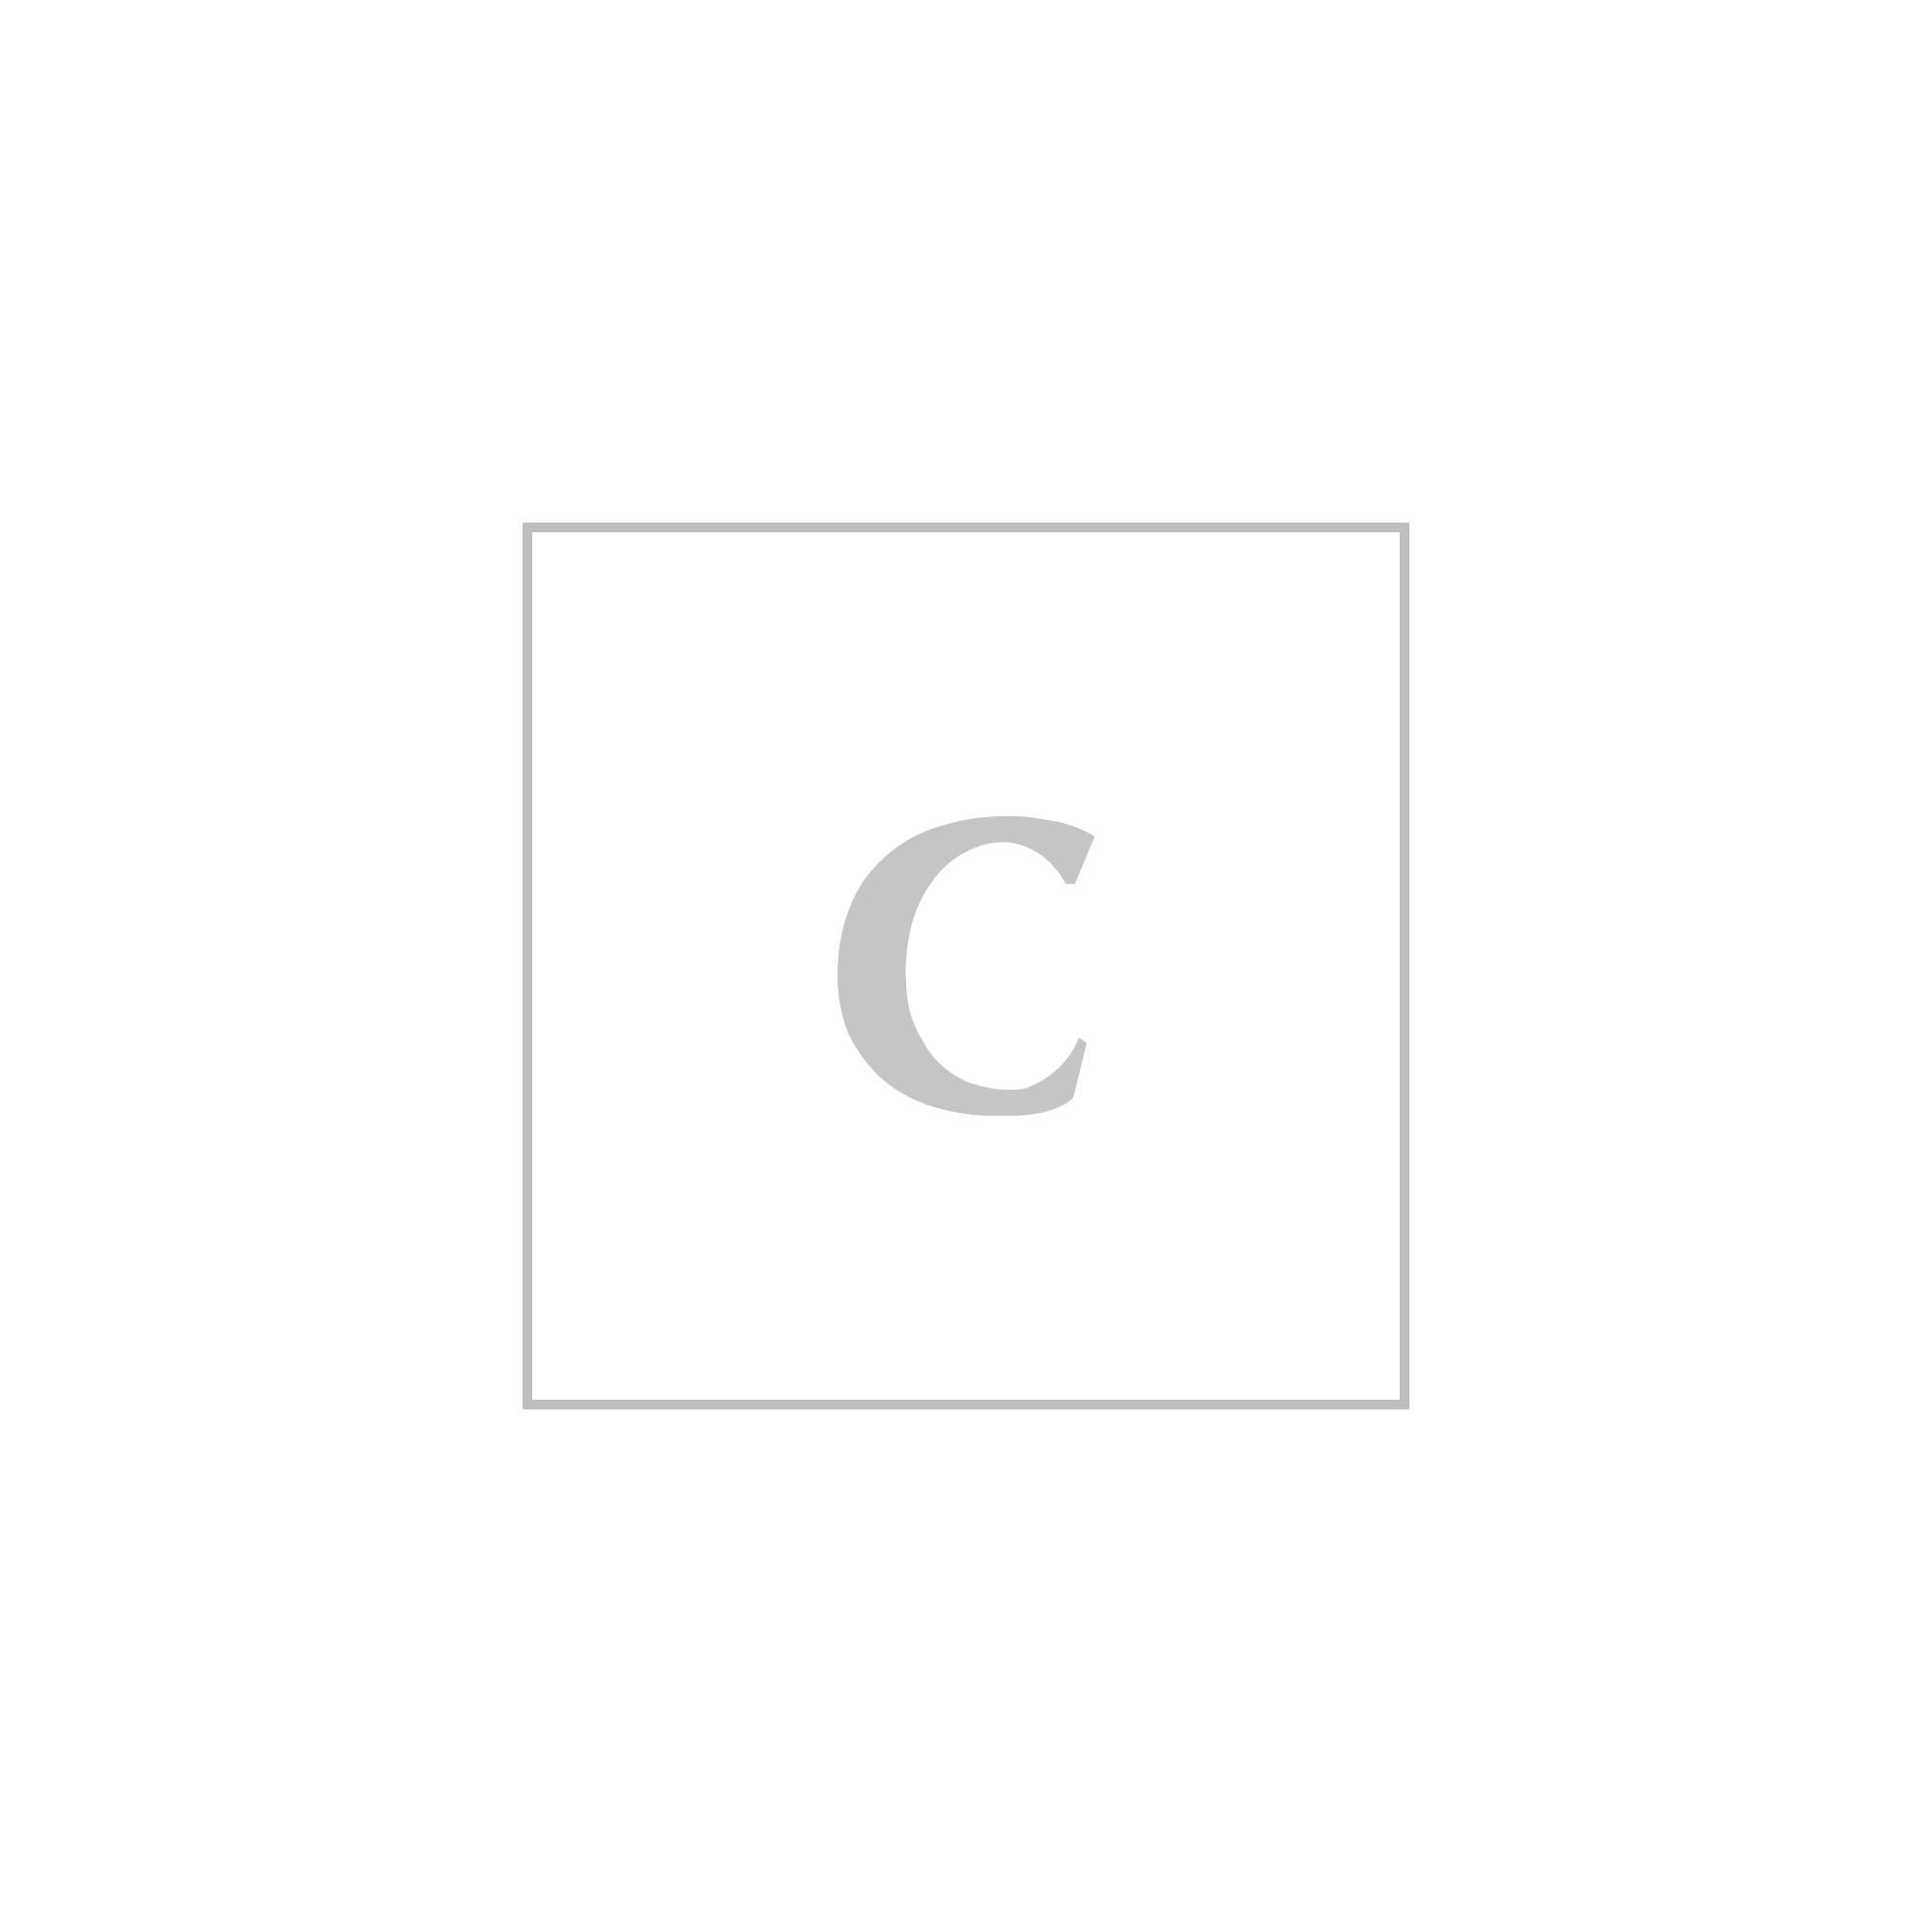 logo cannon beltbag bags men